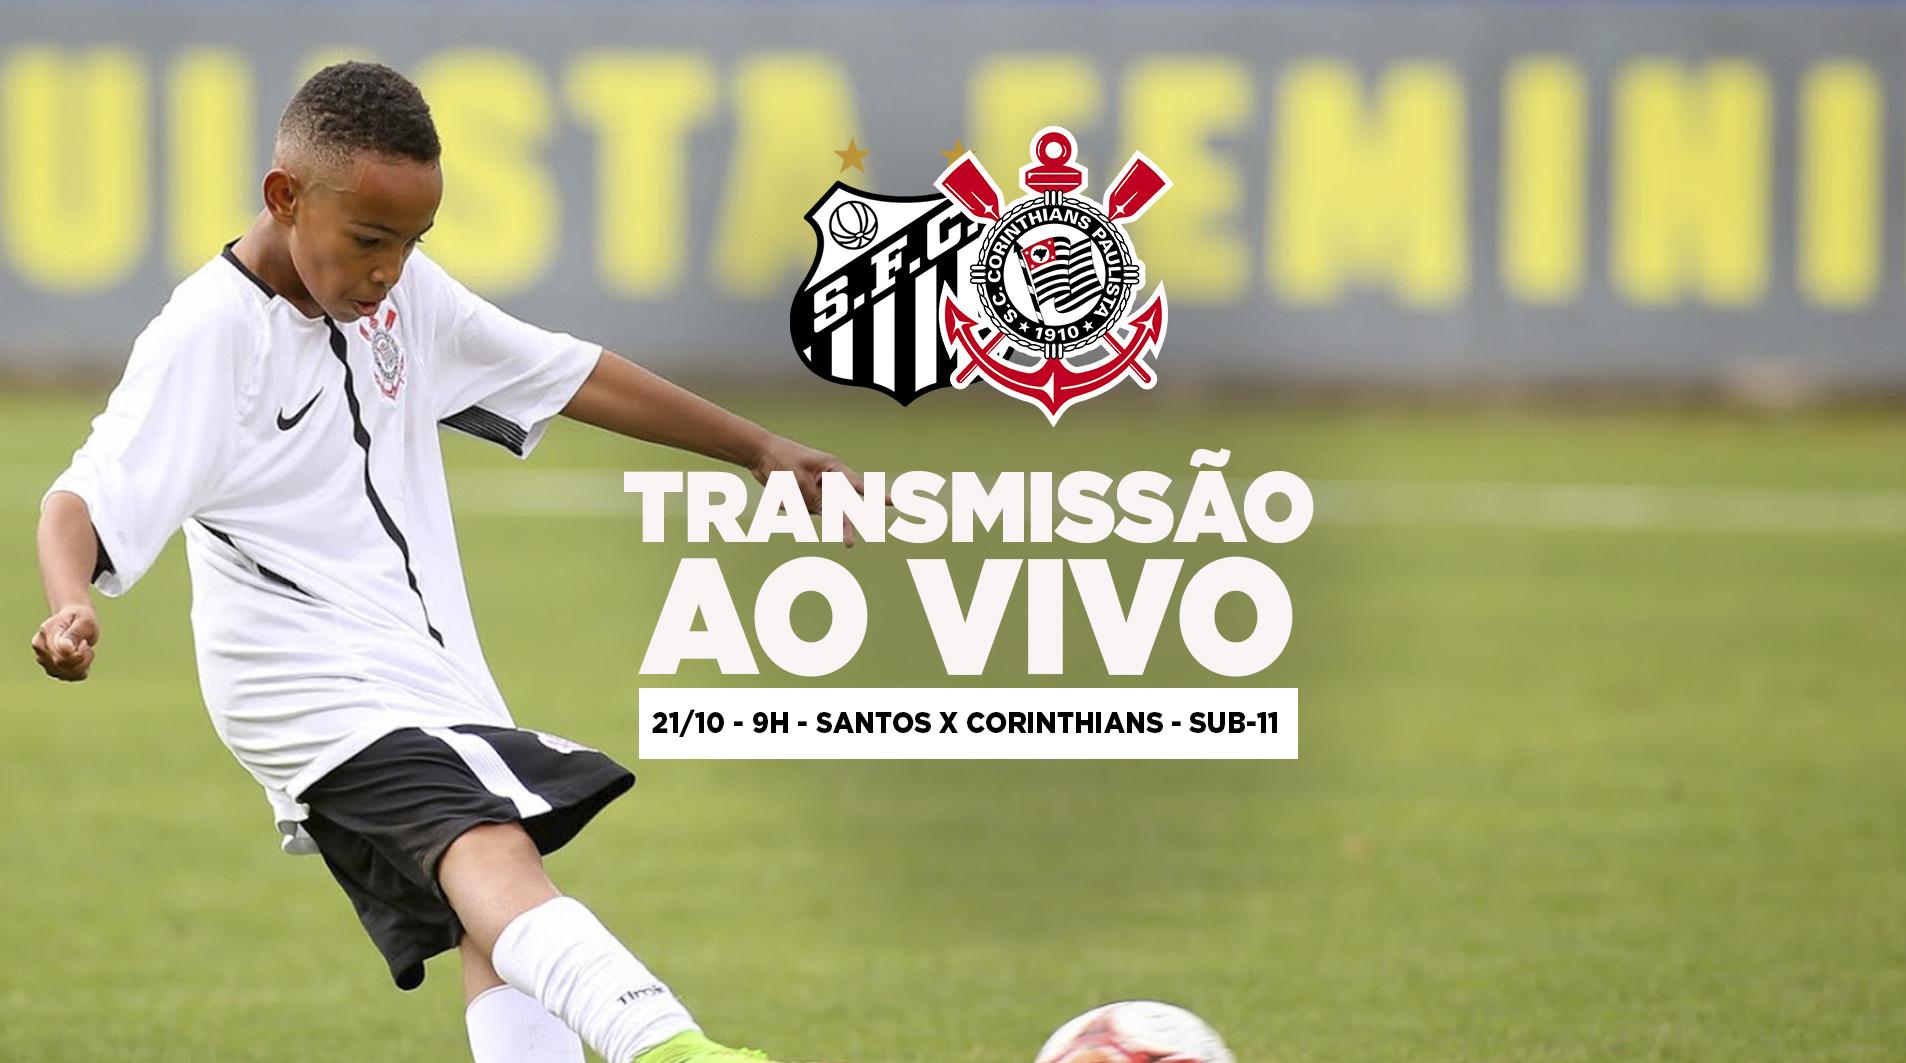 Santos x Corinthians - Paulistão Sub-11